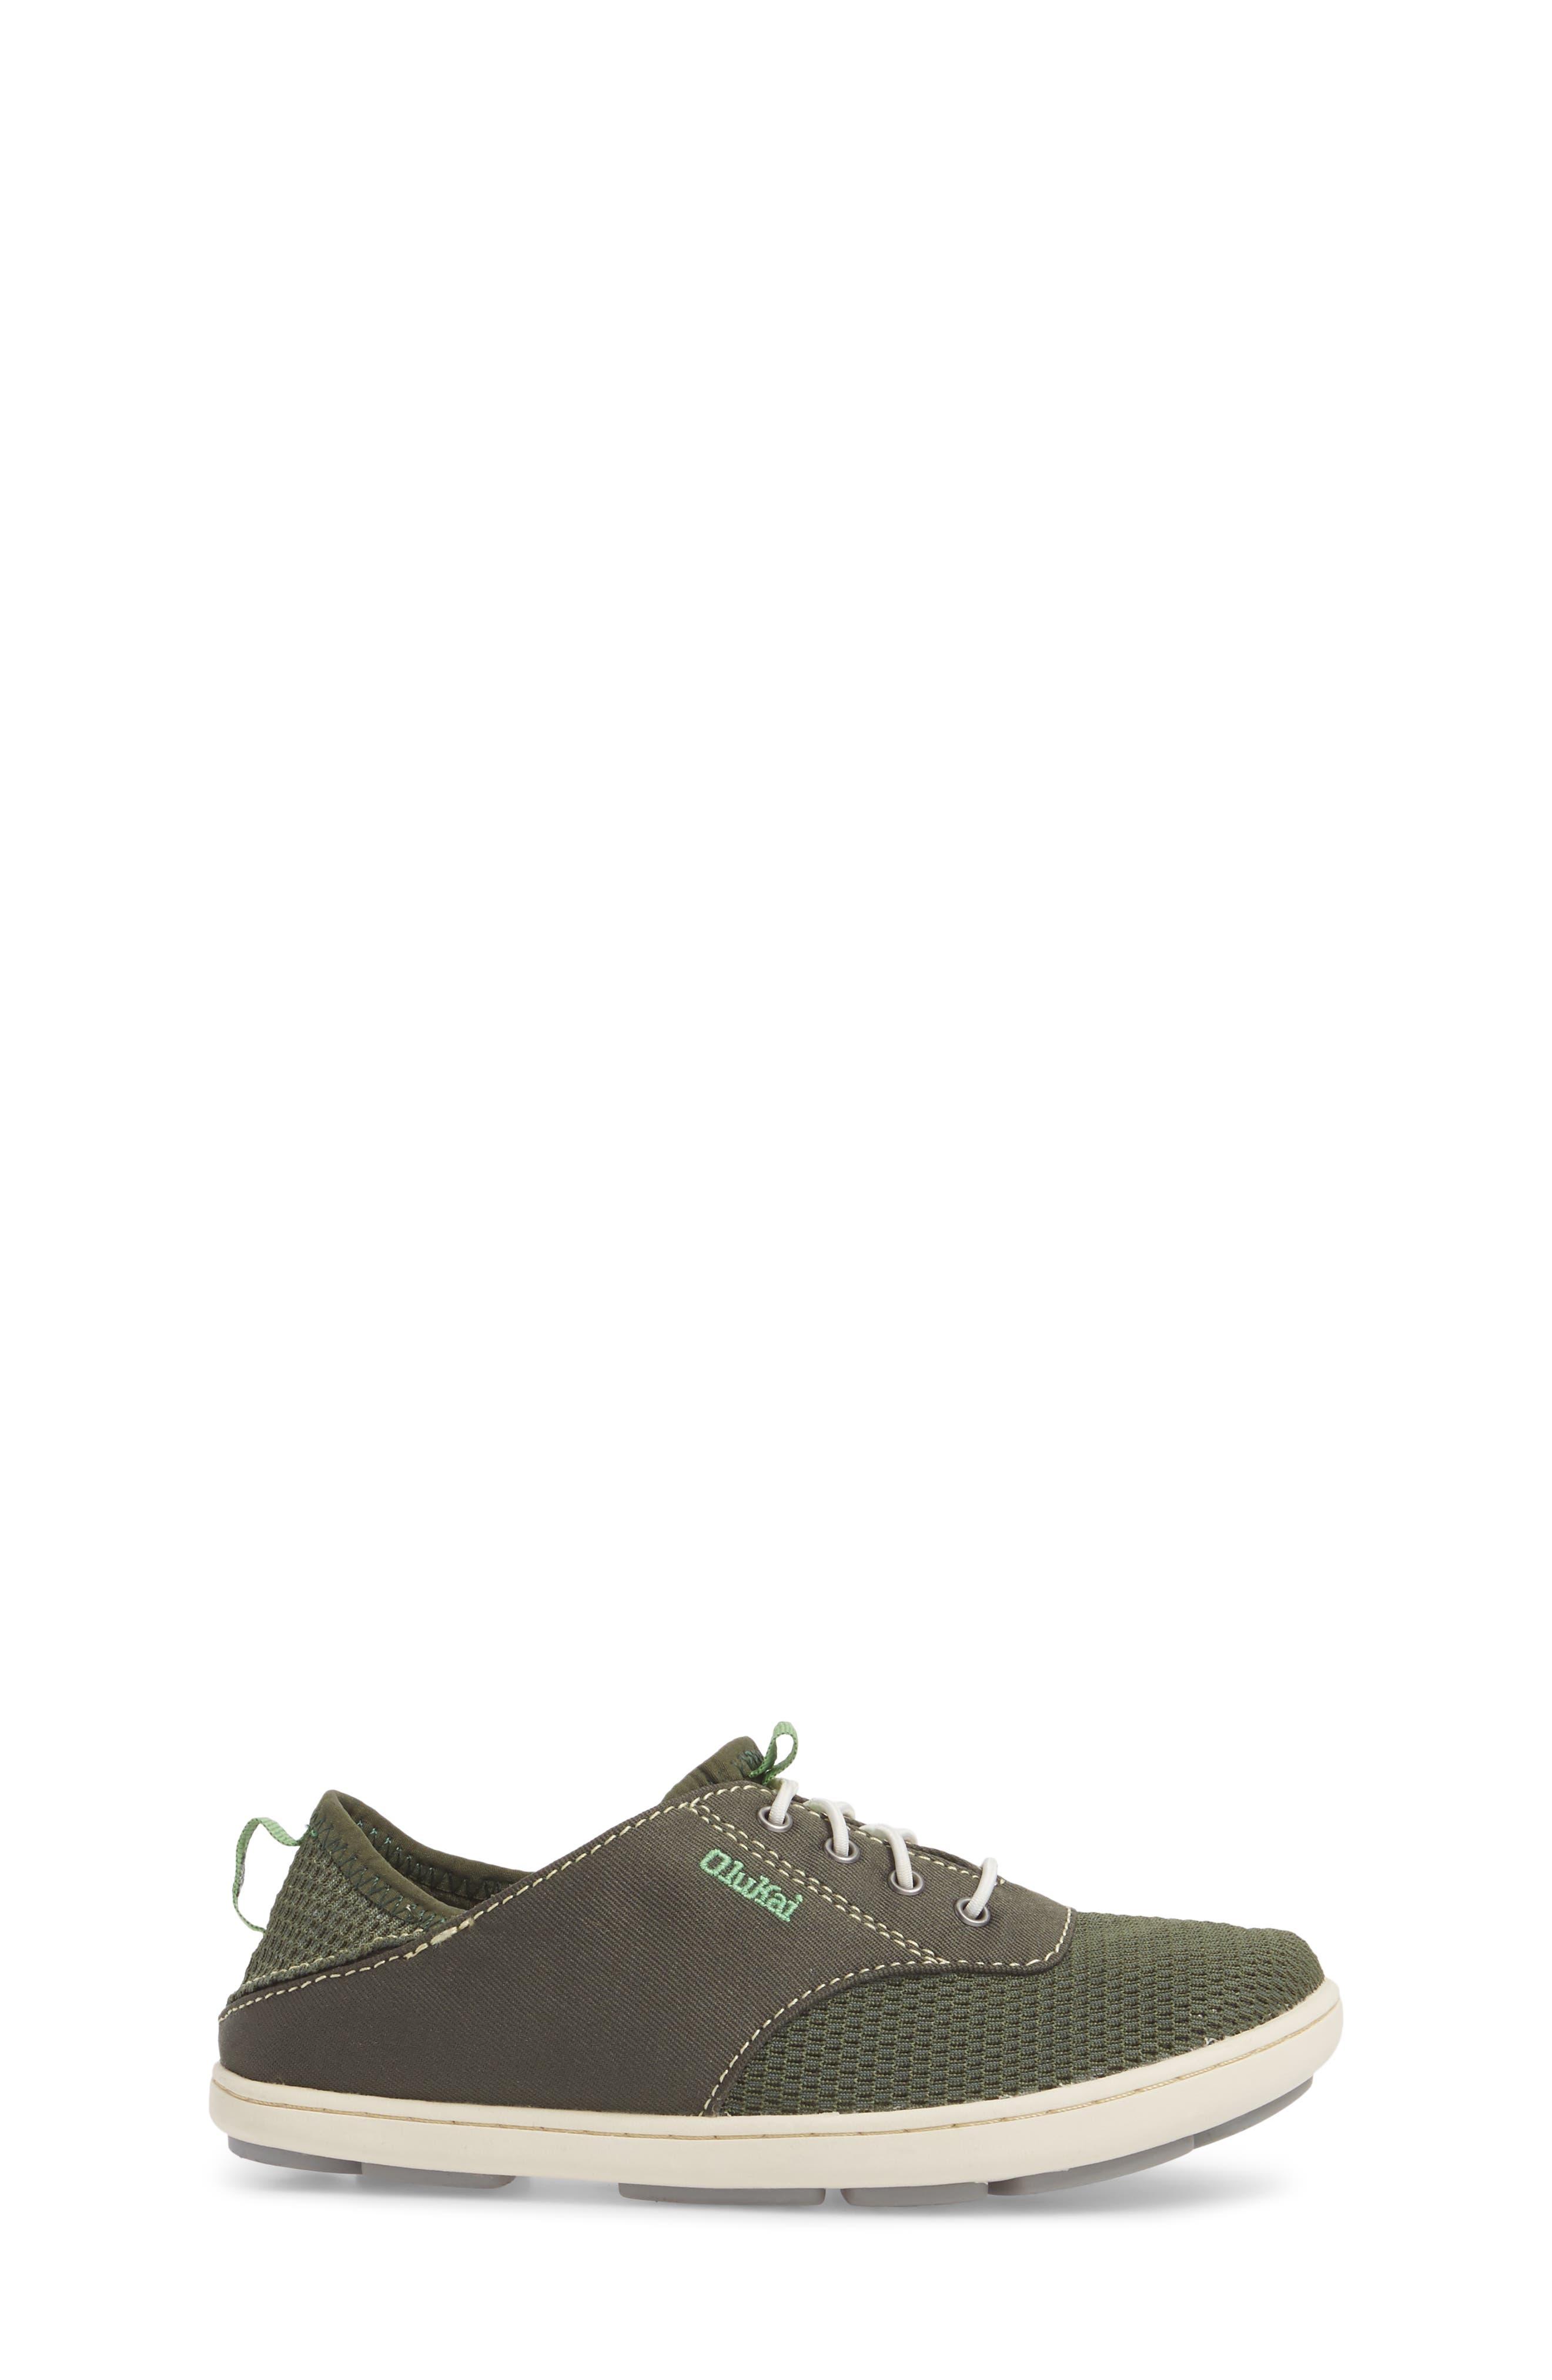 Nohea Moku Water Resistant Shoe,                             Alternate thumbnail 2, color,                             SEA GRASS/ SEA GRASS